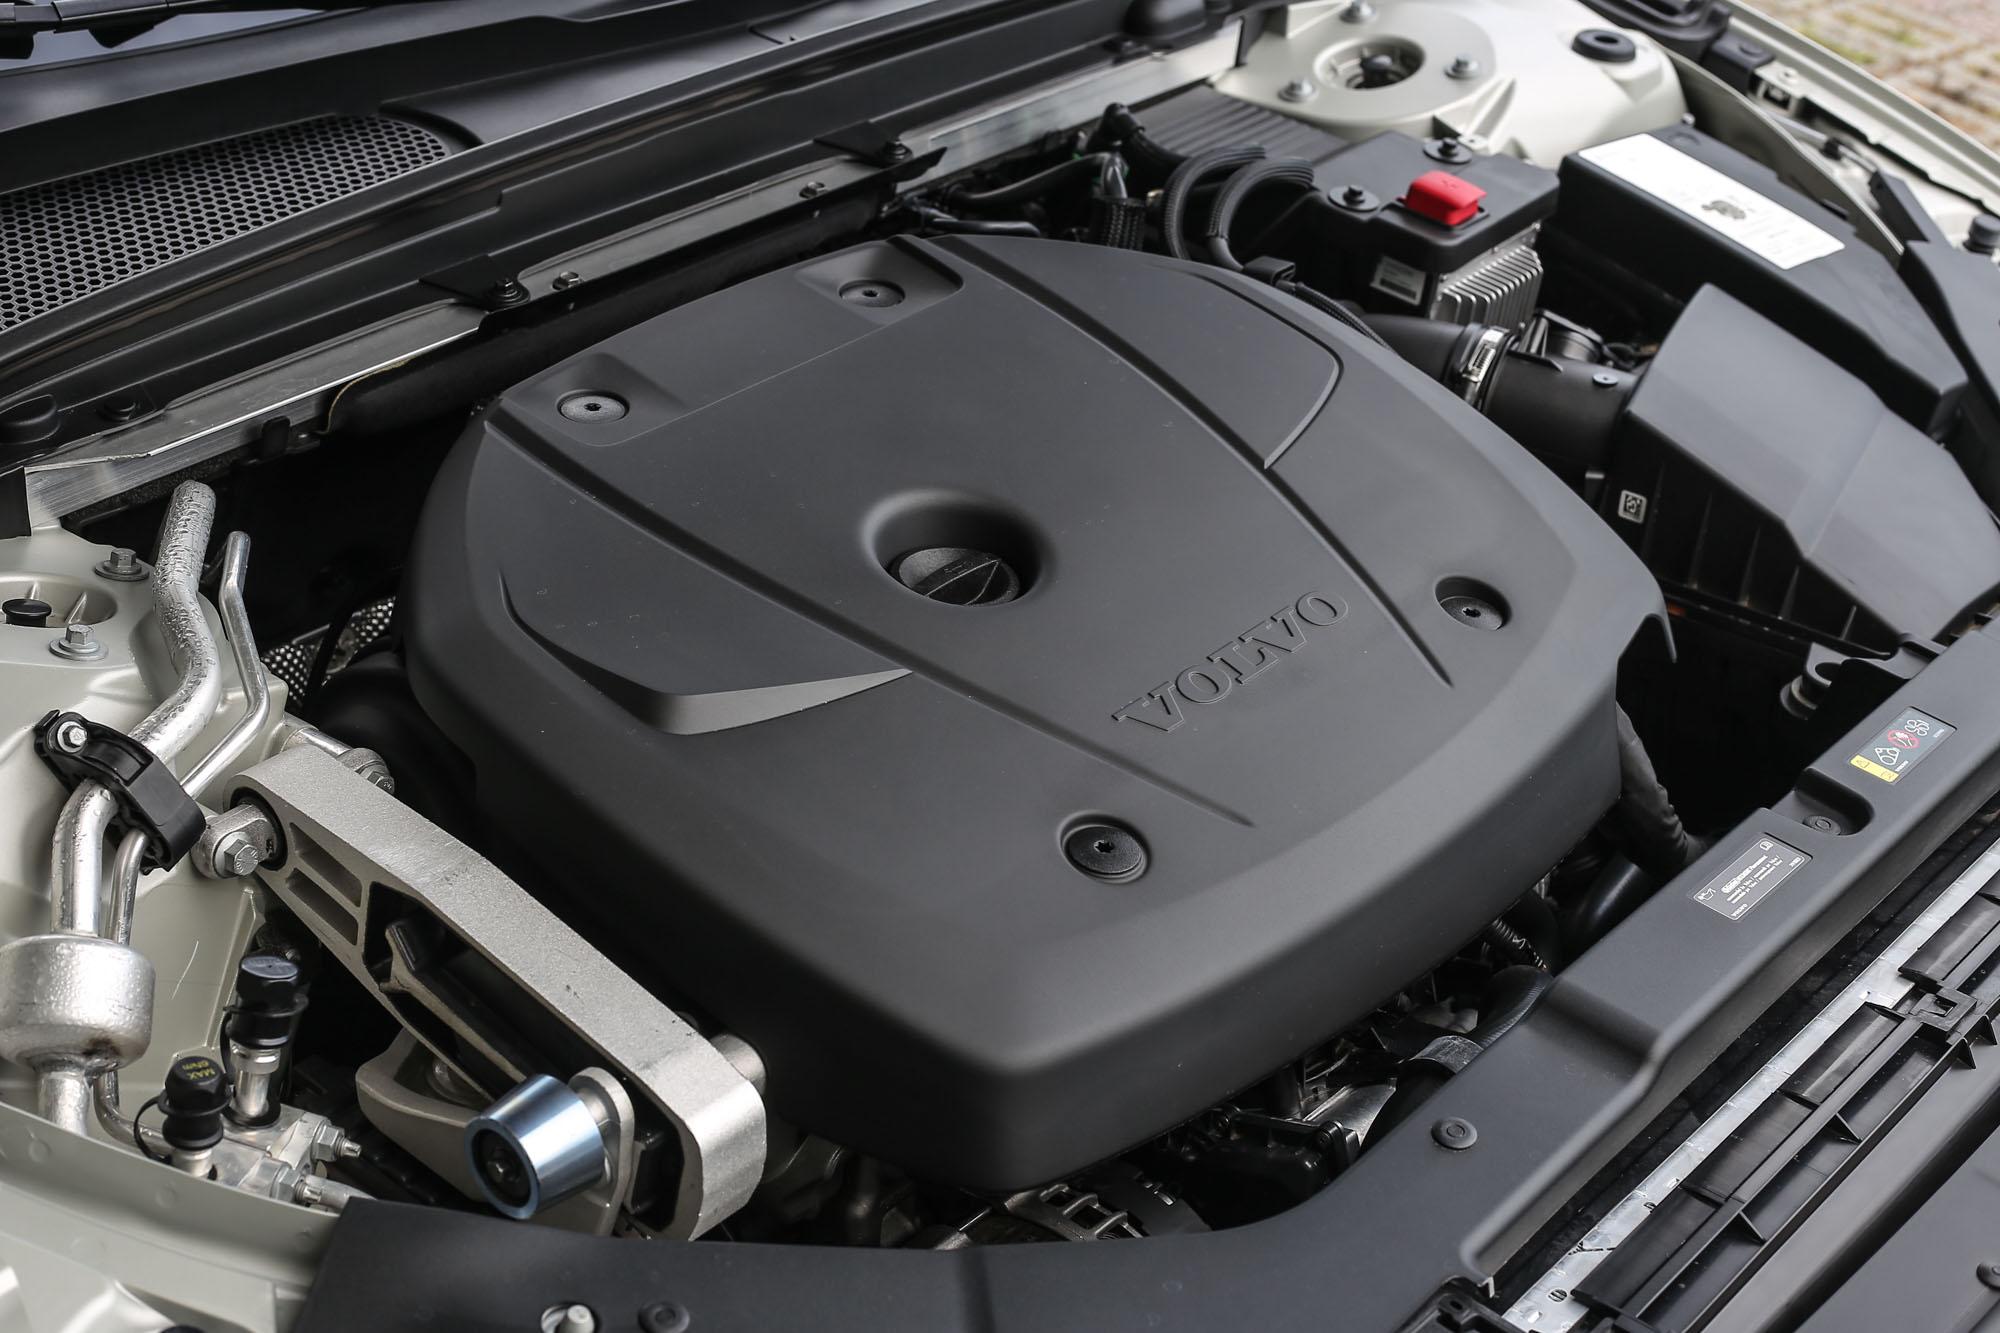 V60 T4 搭載 2.0 升渦輪增壓直列四缸汽油引擎,具備 190hp / 5000rpm 最大馬力與 30.6kgm / 1400-4000rpm 最大扭力輸出。